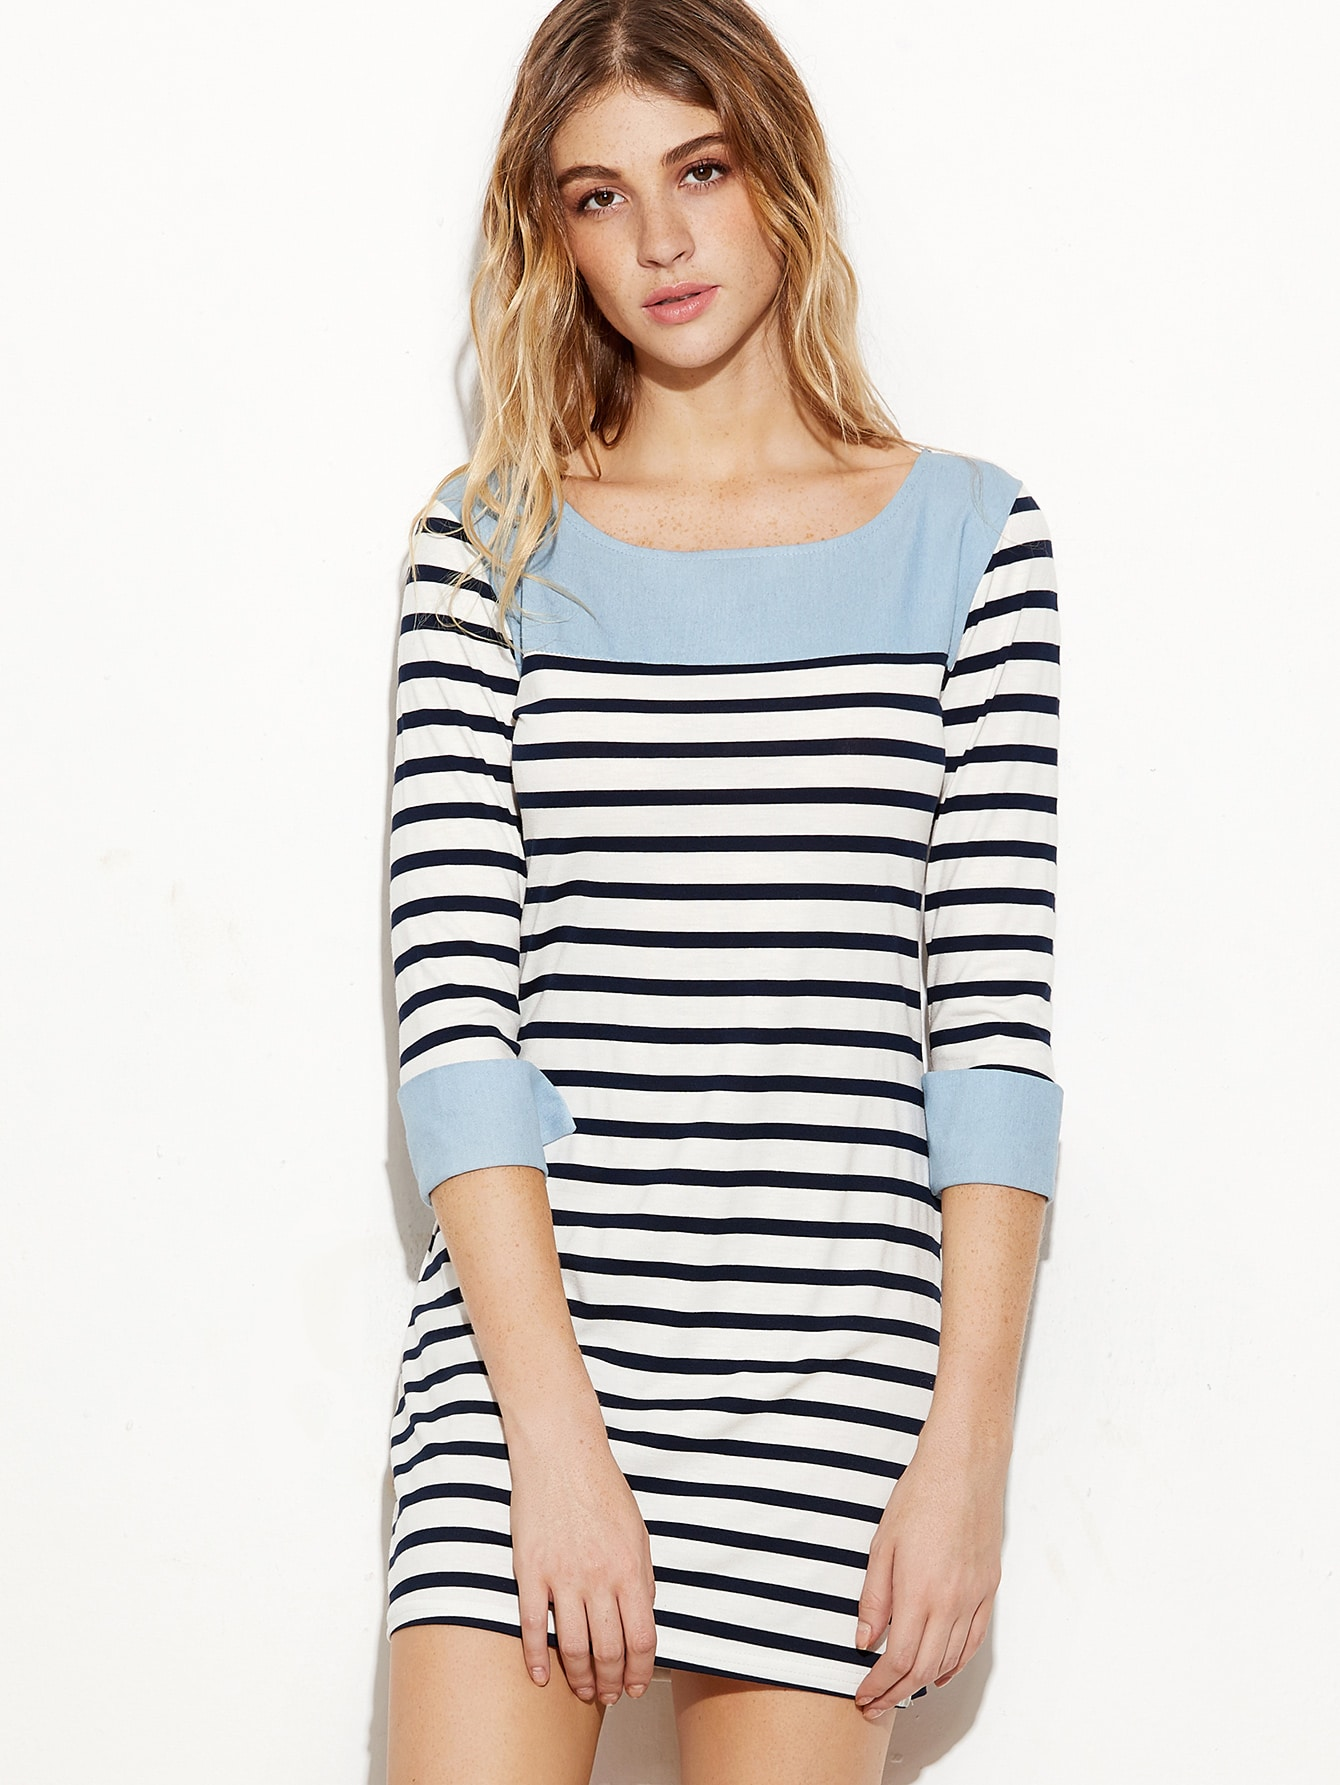 Contrast Trim Striped Cuffed Sheath Dress dress161110101